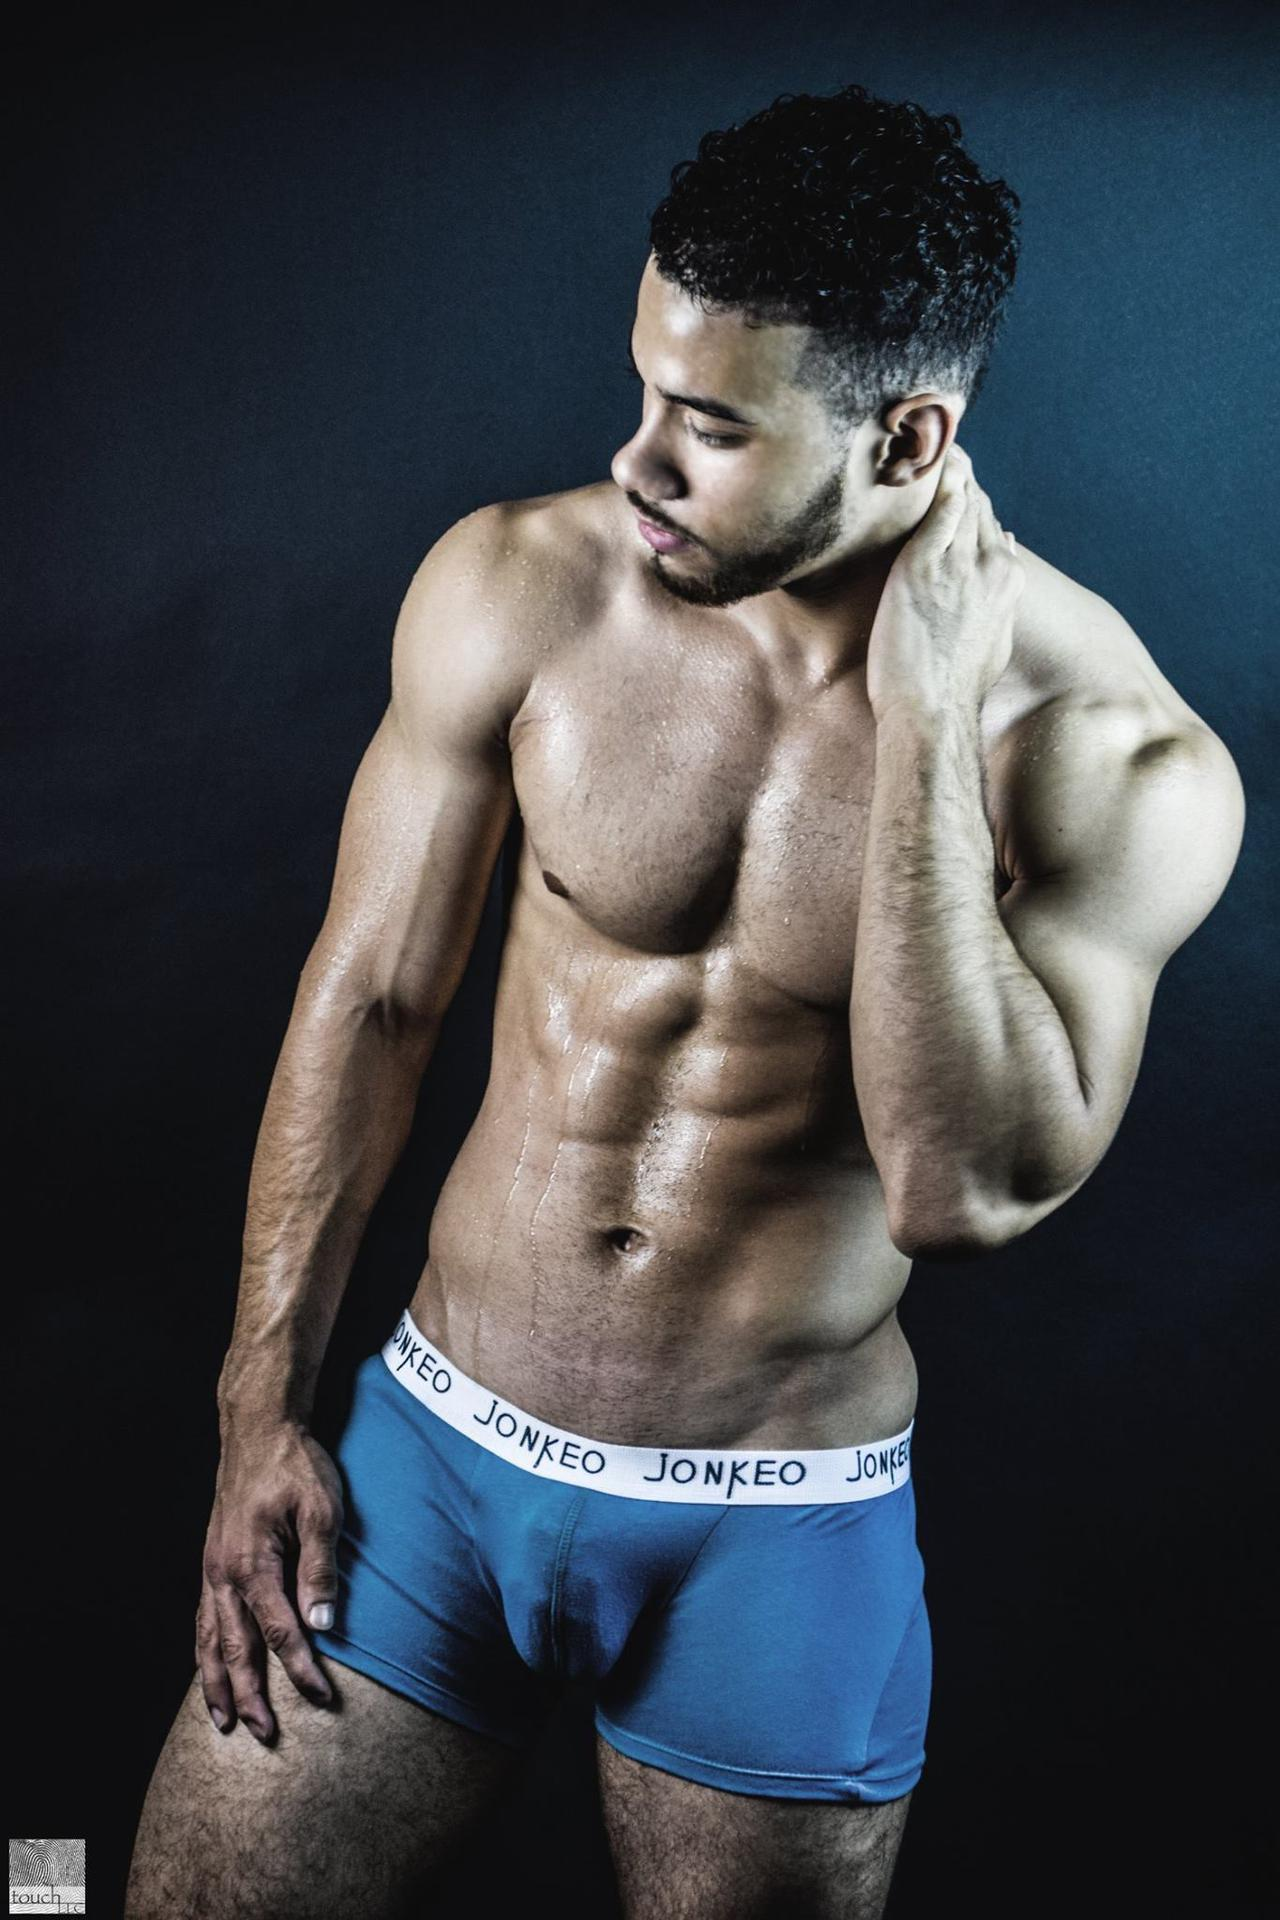 mens underwear - Jonkeo